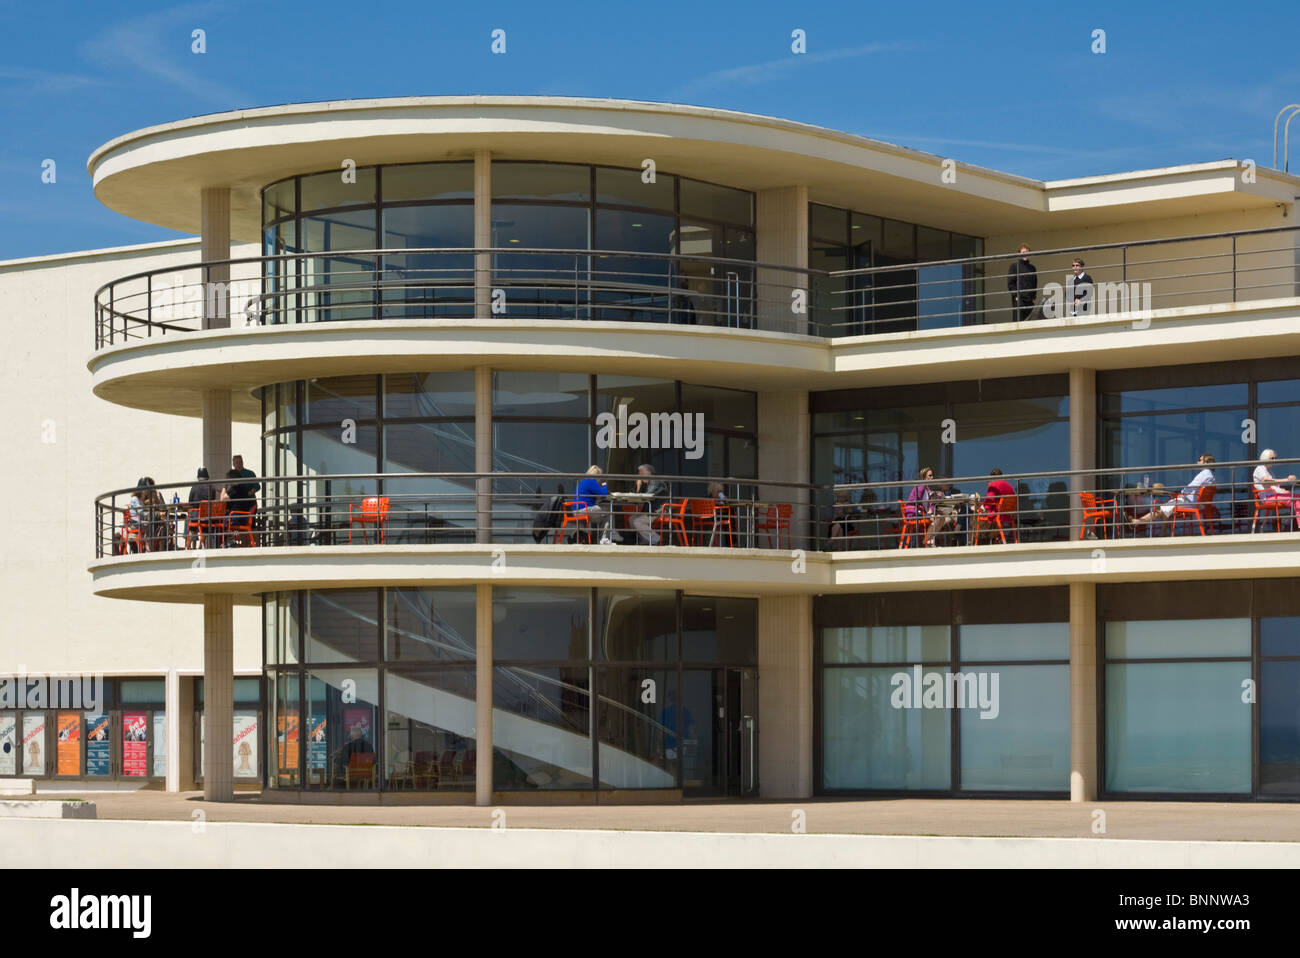 Exterior architecture details of the De La Warr Pavilion, Bexhill on Sea, East Sussex, England, GB, UK, EU, Europe Stock Photo